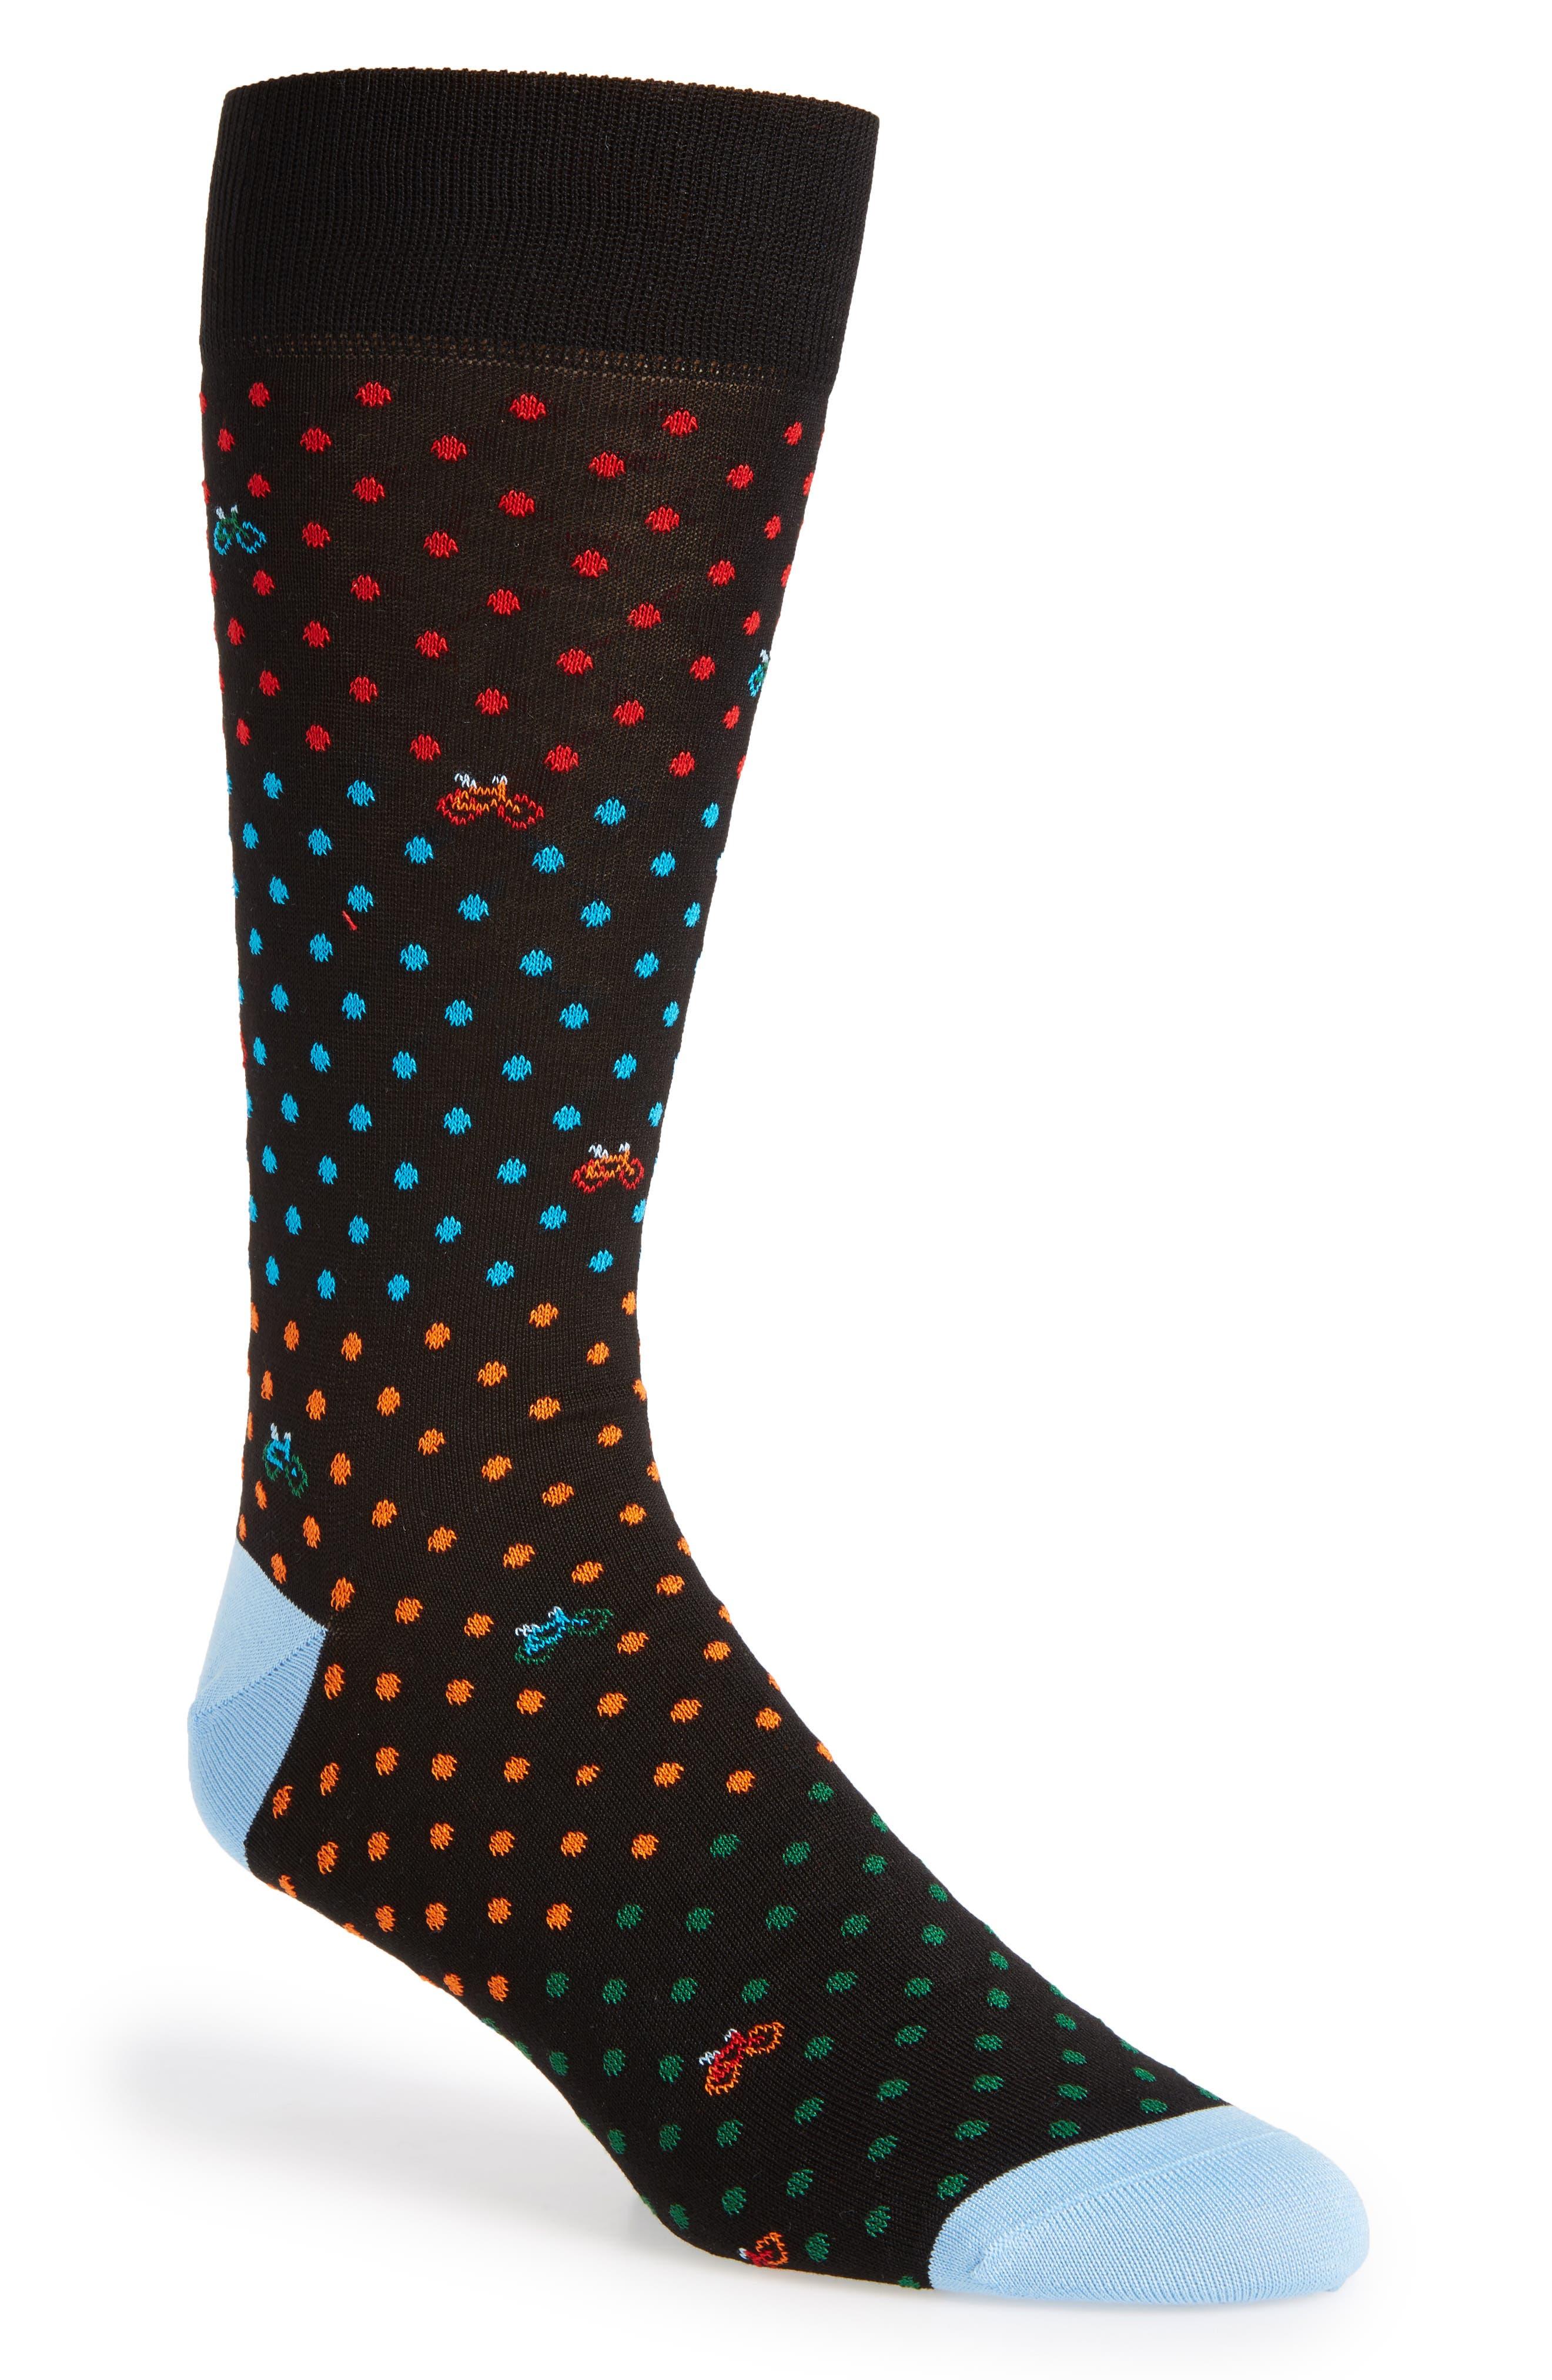 Dot Bike Socks,                             Main thumbnail 1, color,                             001